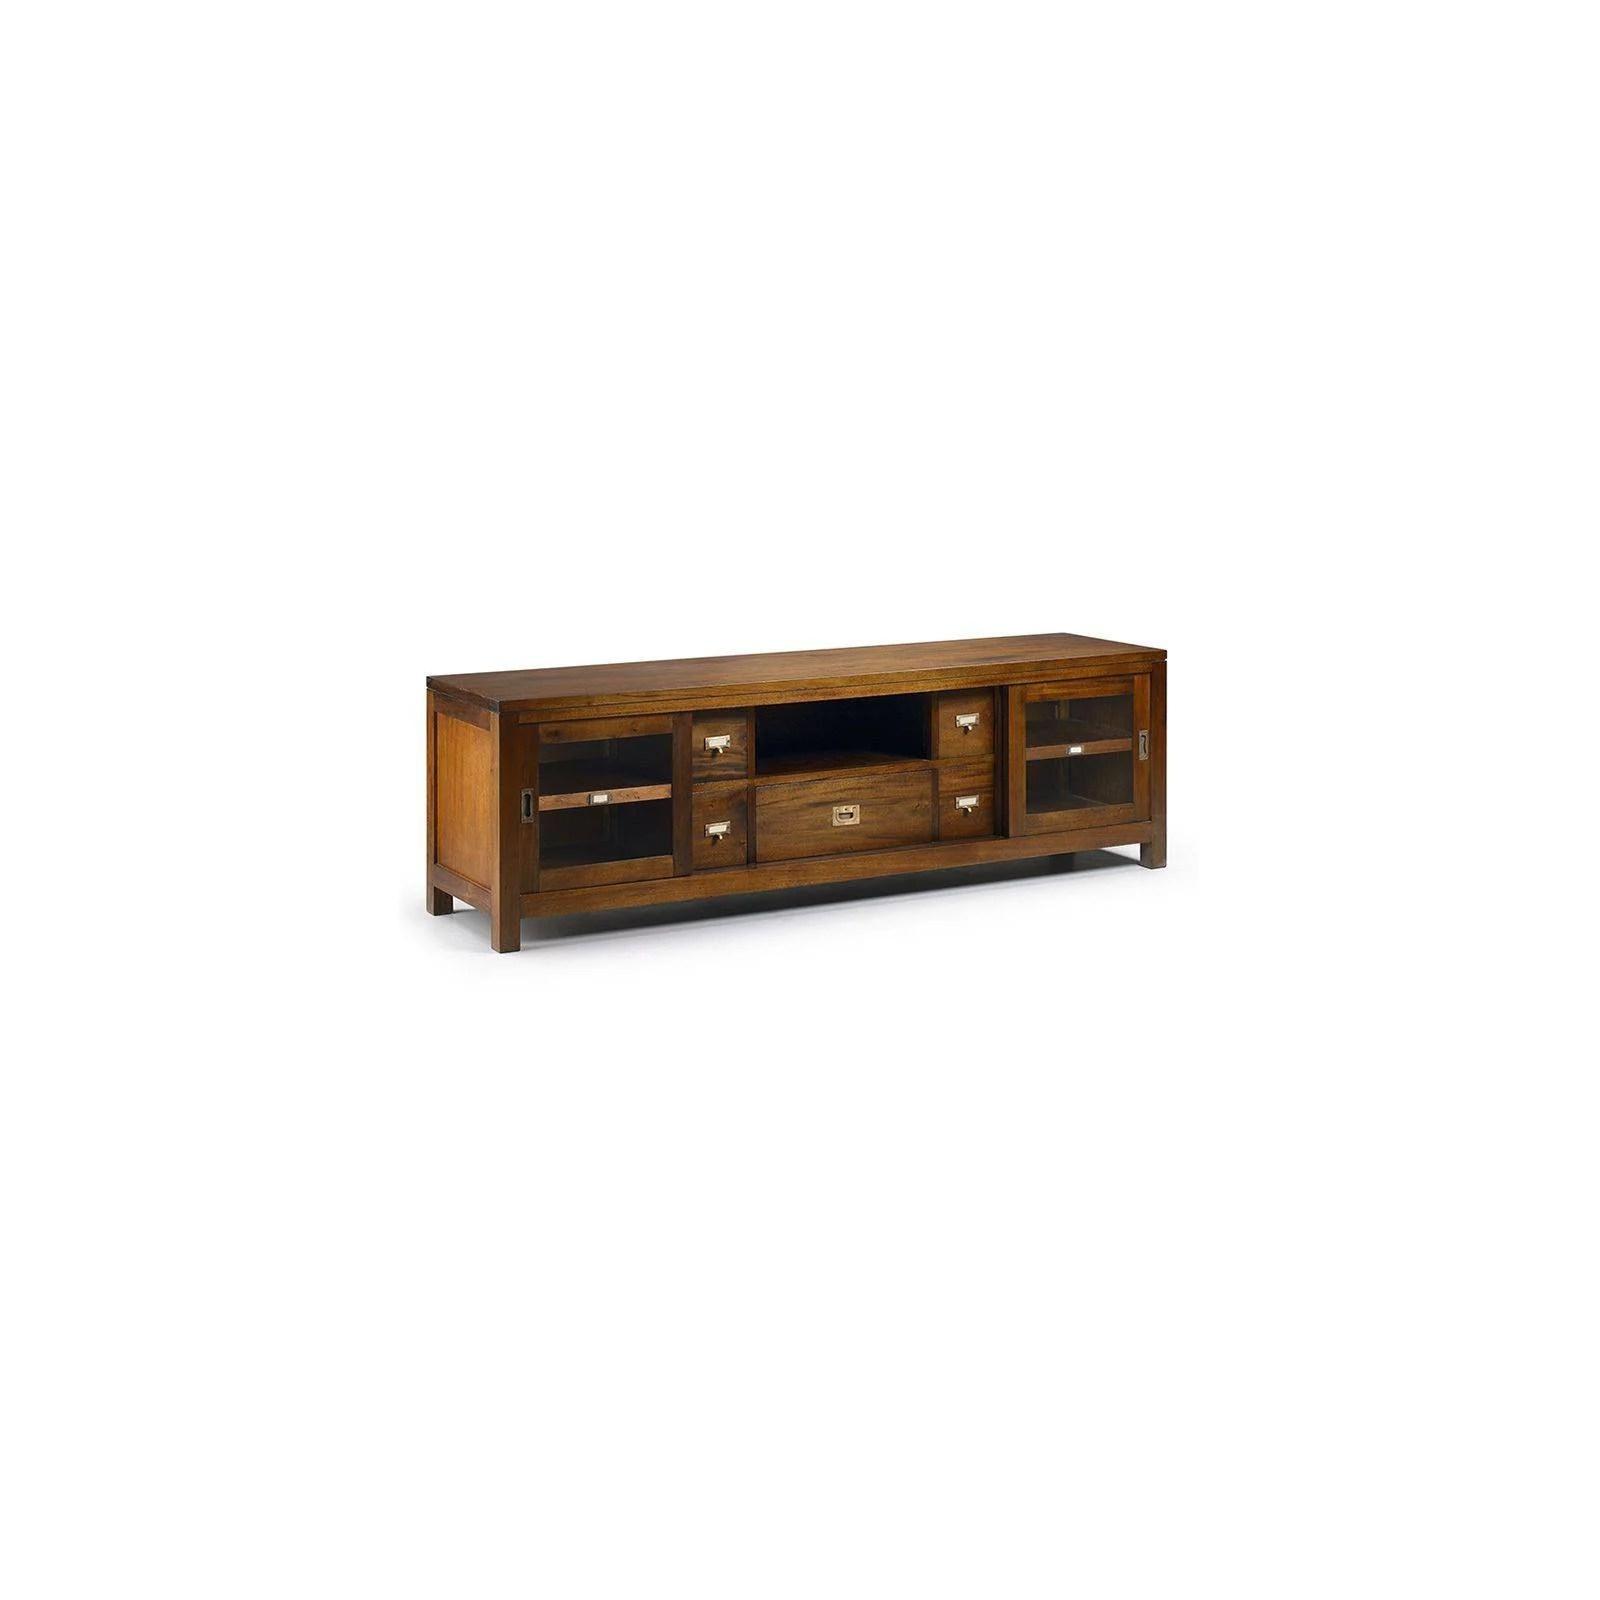 meuble tv gm colonial acajou massif meuble tendance exotique